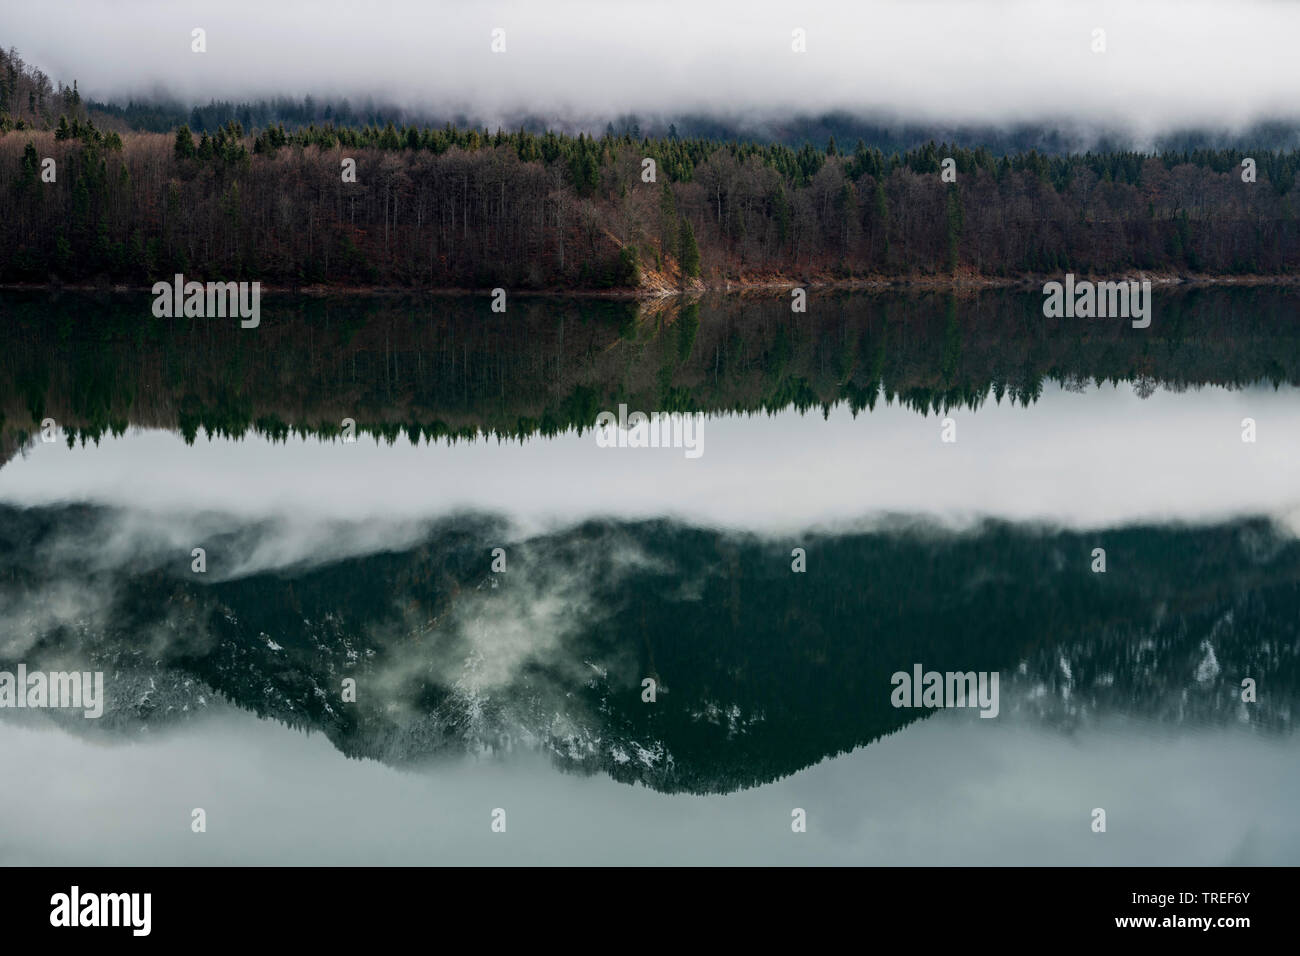 Lake Sylvenstein with mirror image of the landscape, Germany, Bavaria, Karwendel Mountains Stock Photo